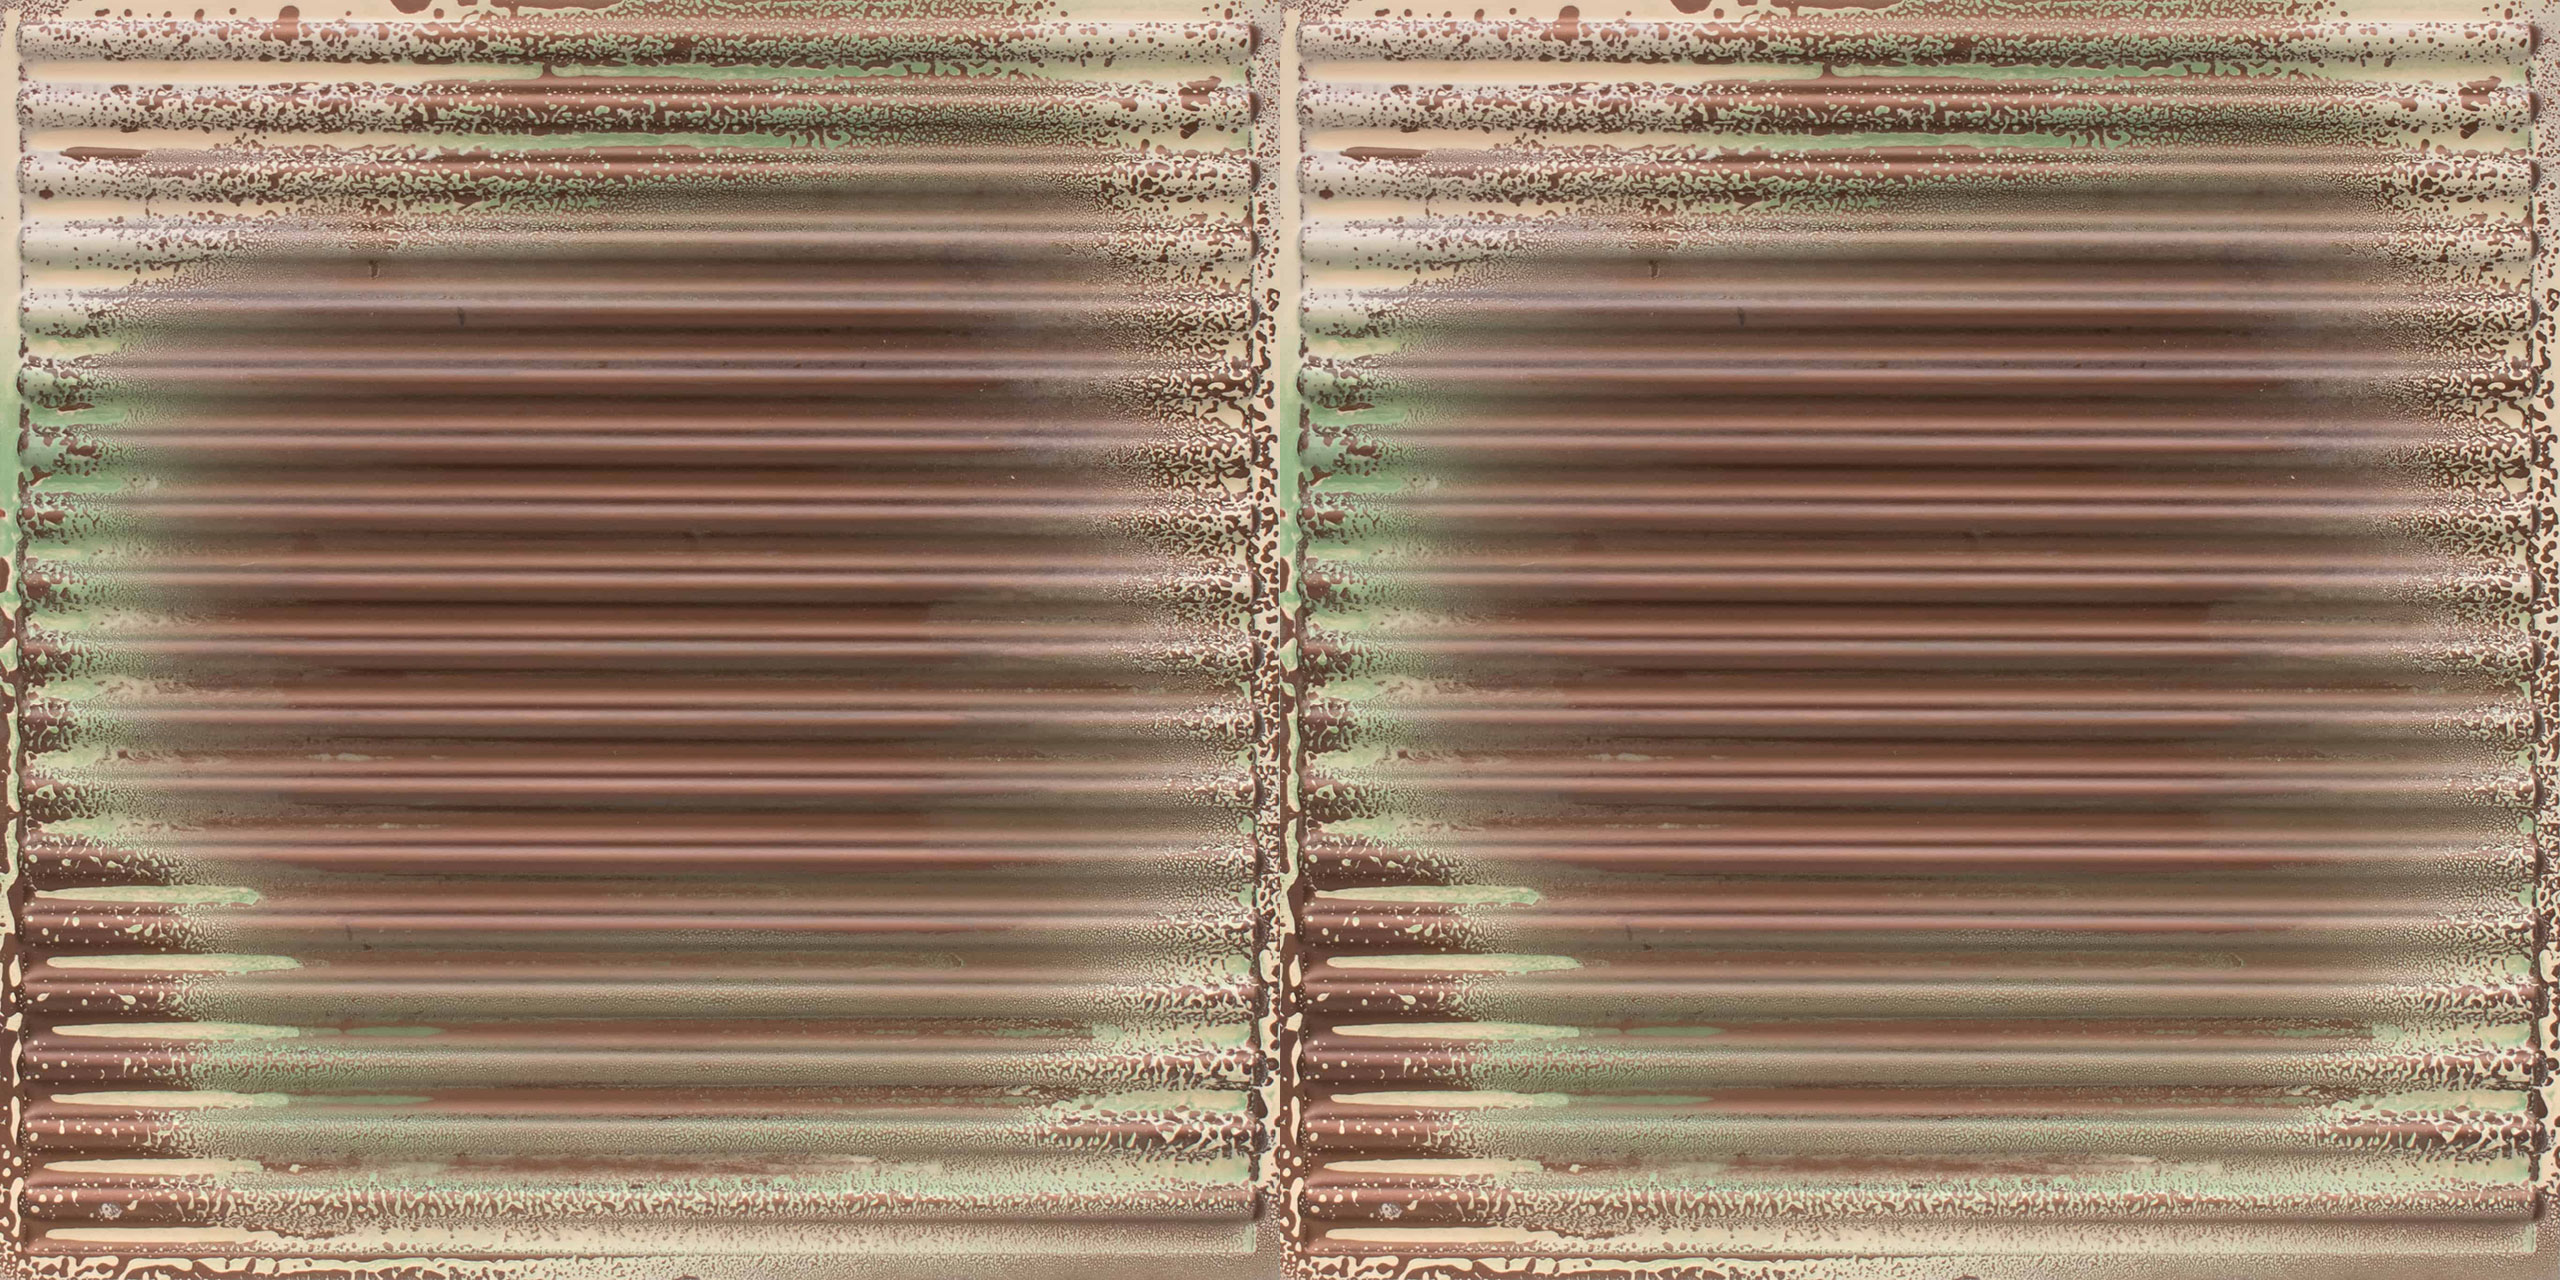 Ridged Metal - Corrugated Faux Tin Ceiling Tile  #261